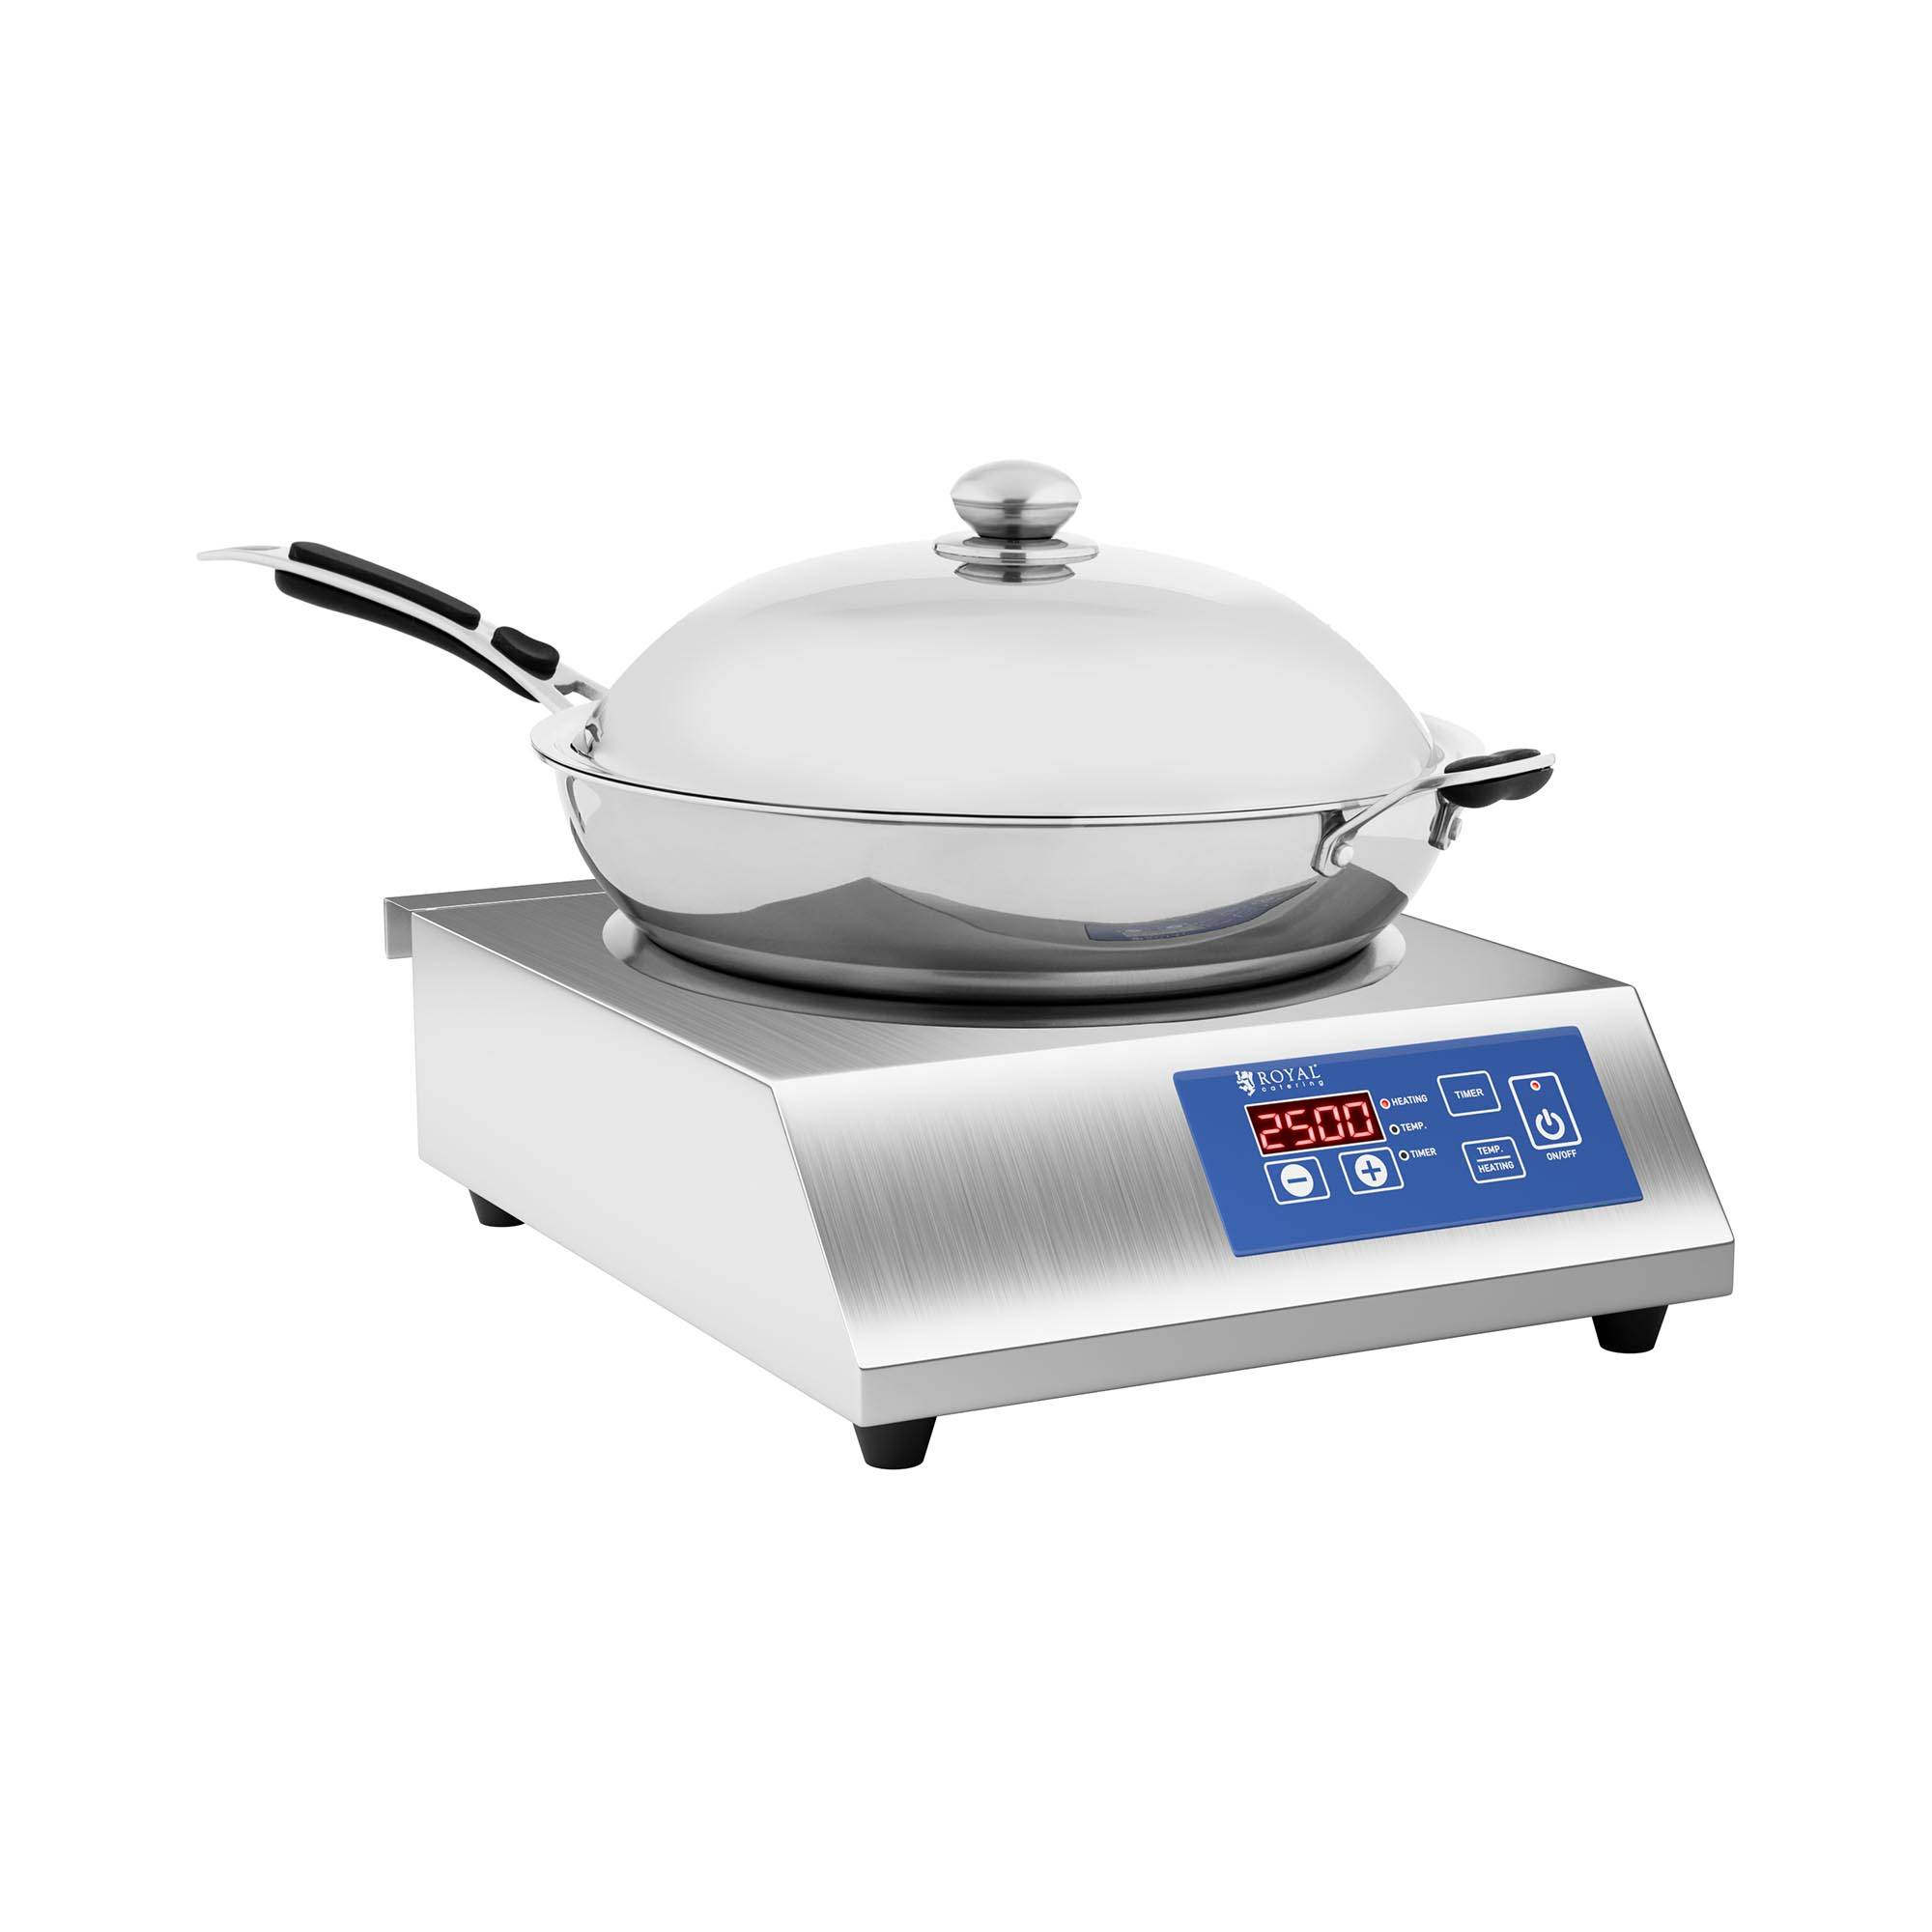 royal catering piastra per wok a induzione - wok incluso - Ø 36 cm - 60 a 240 °c - timer - per uso professionale